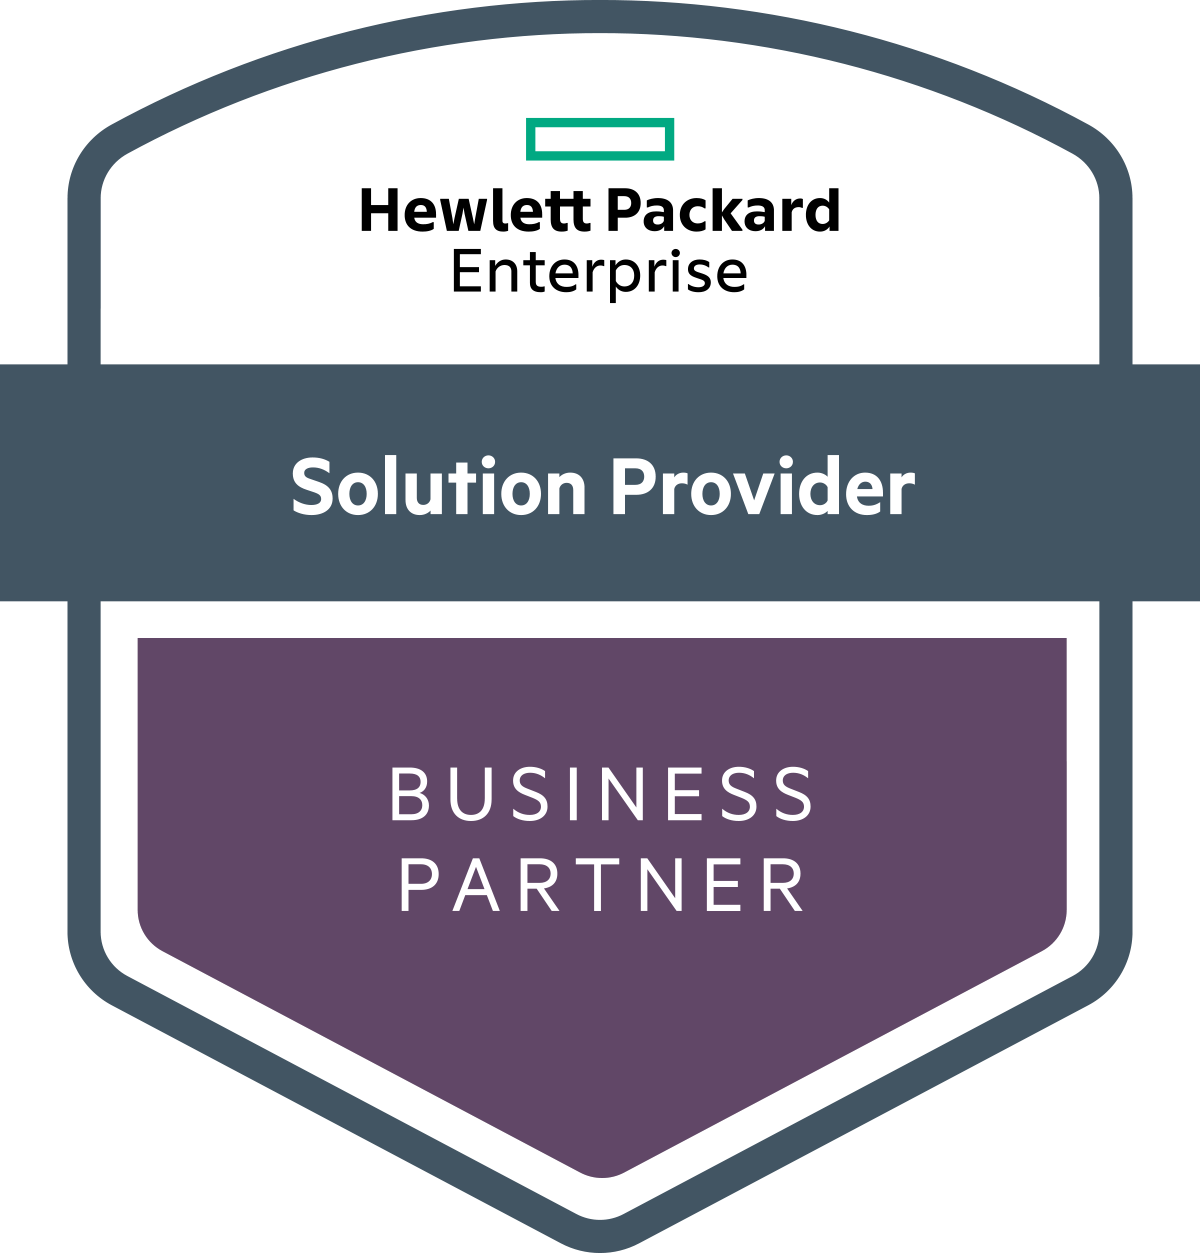 hewlett packard enterprise solution provider business partner graphic